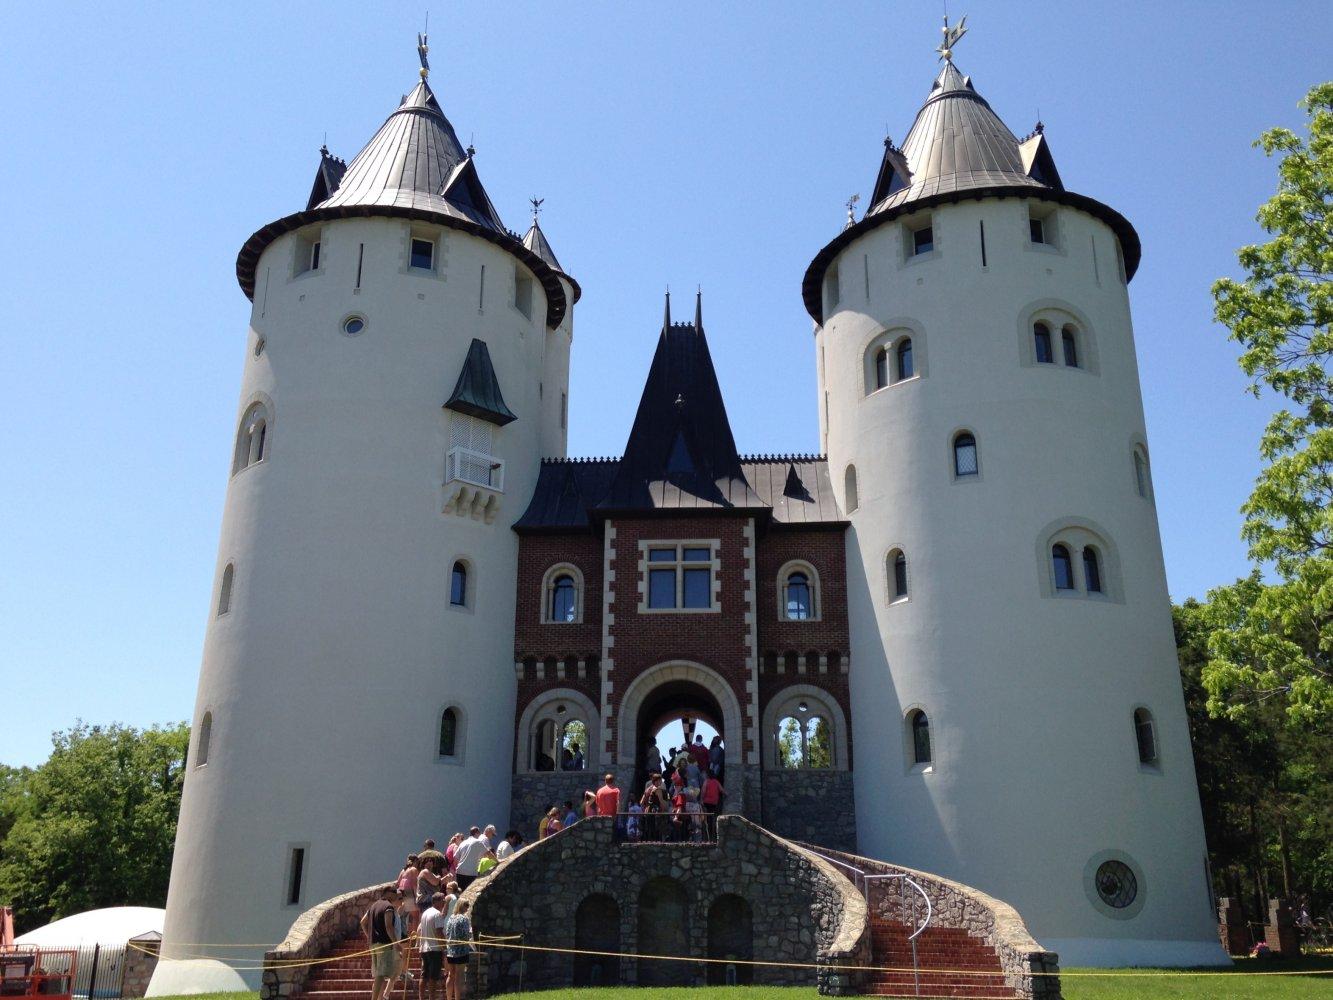 Фото Замок. Соединенные Штаты Америки, Tennessee, Arrington, Newcastle Road, 2124